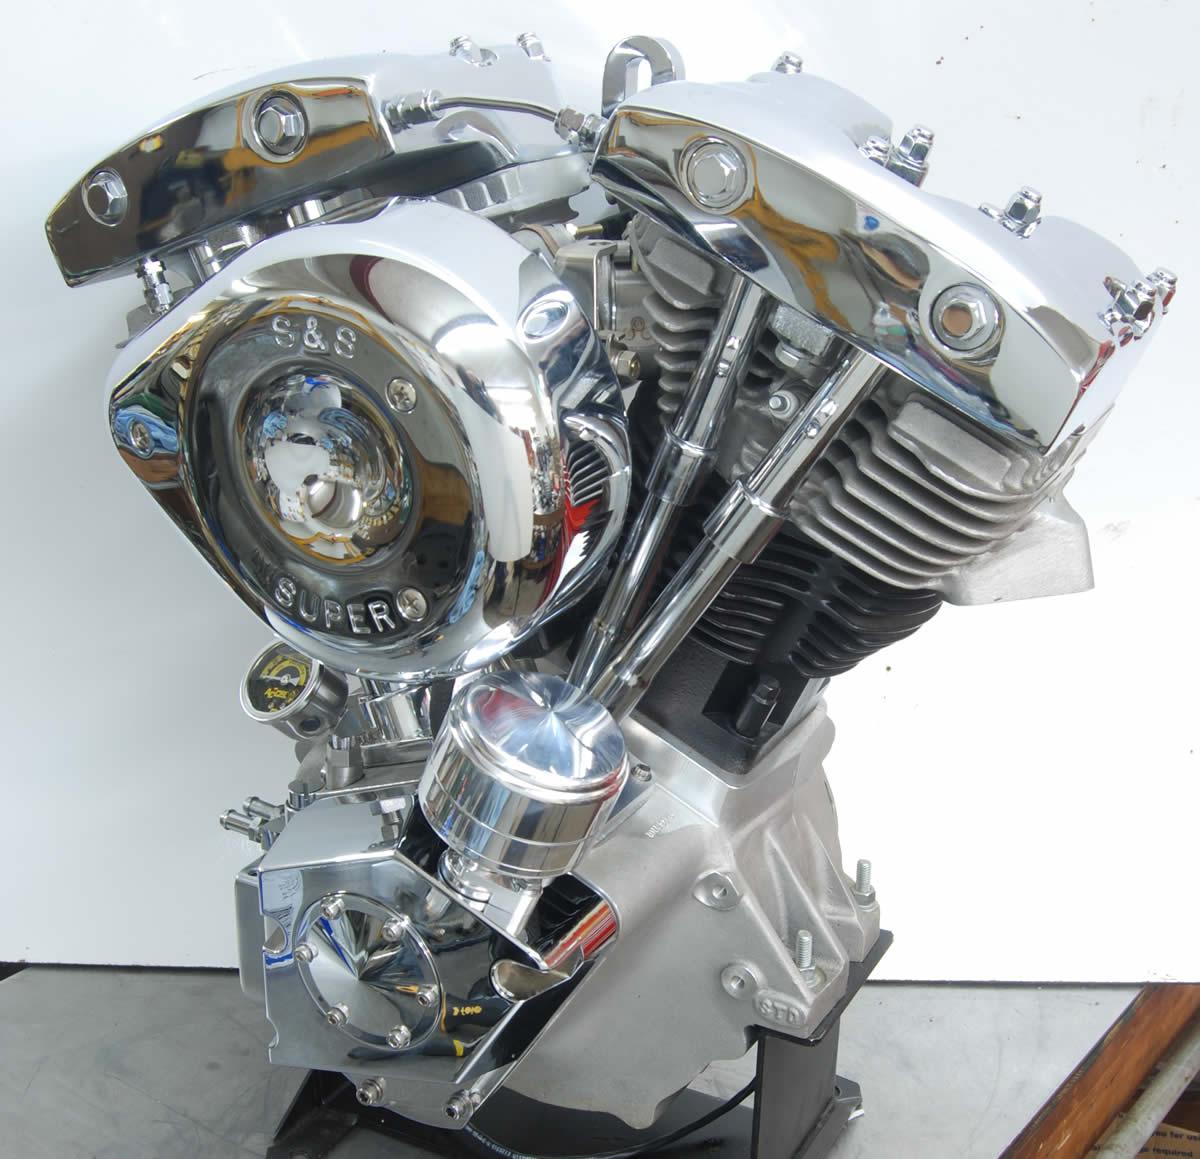 Harley Davidson Shovelhead Engines For Sale